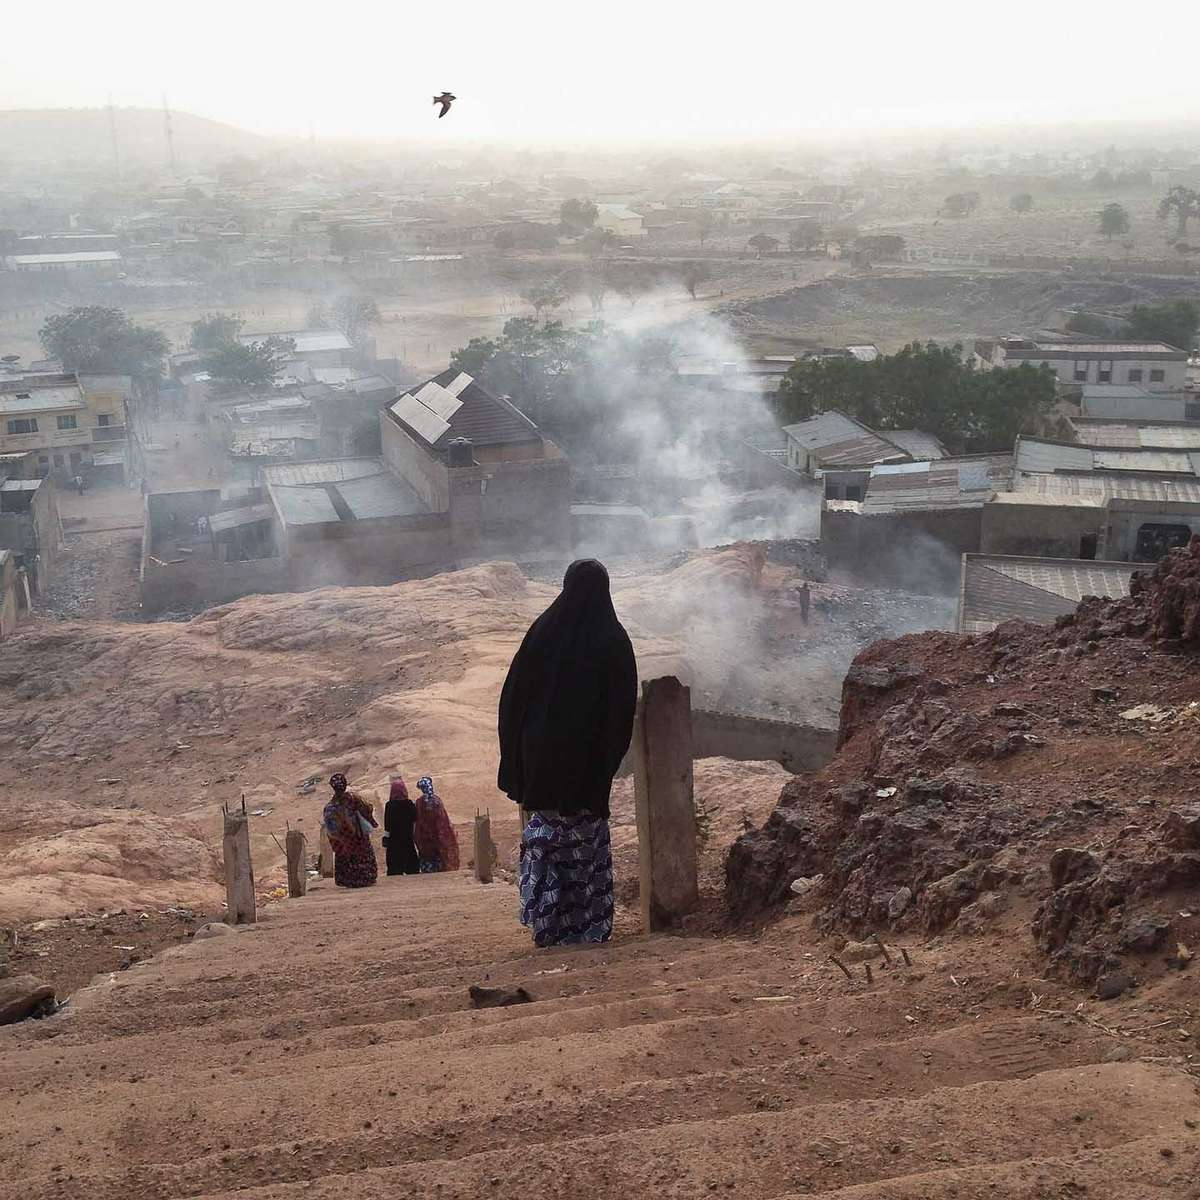 Dala Hill. Kano, Northern Nigeria. February 2014.